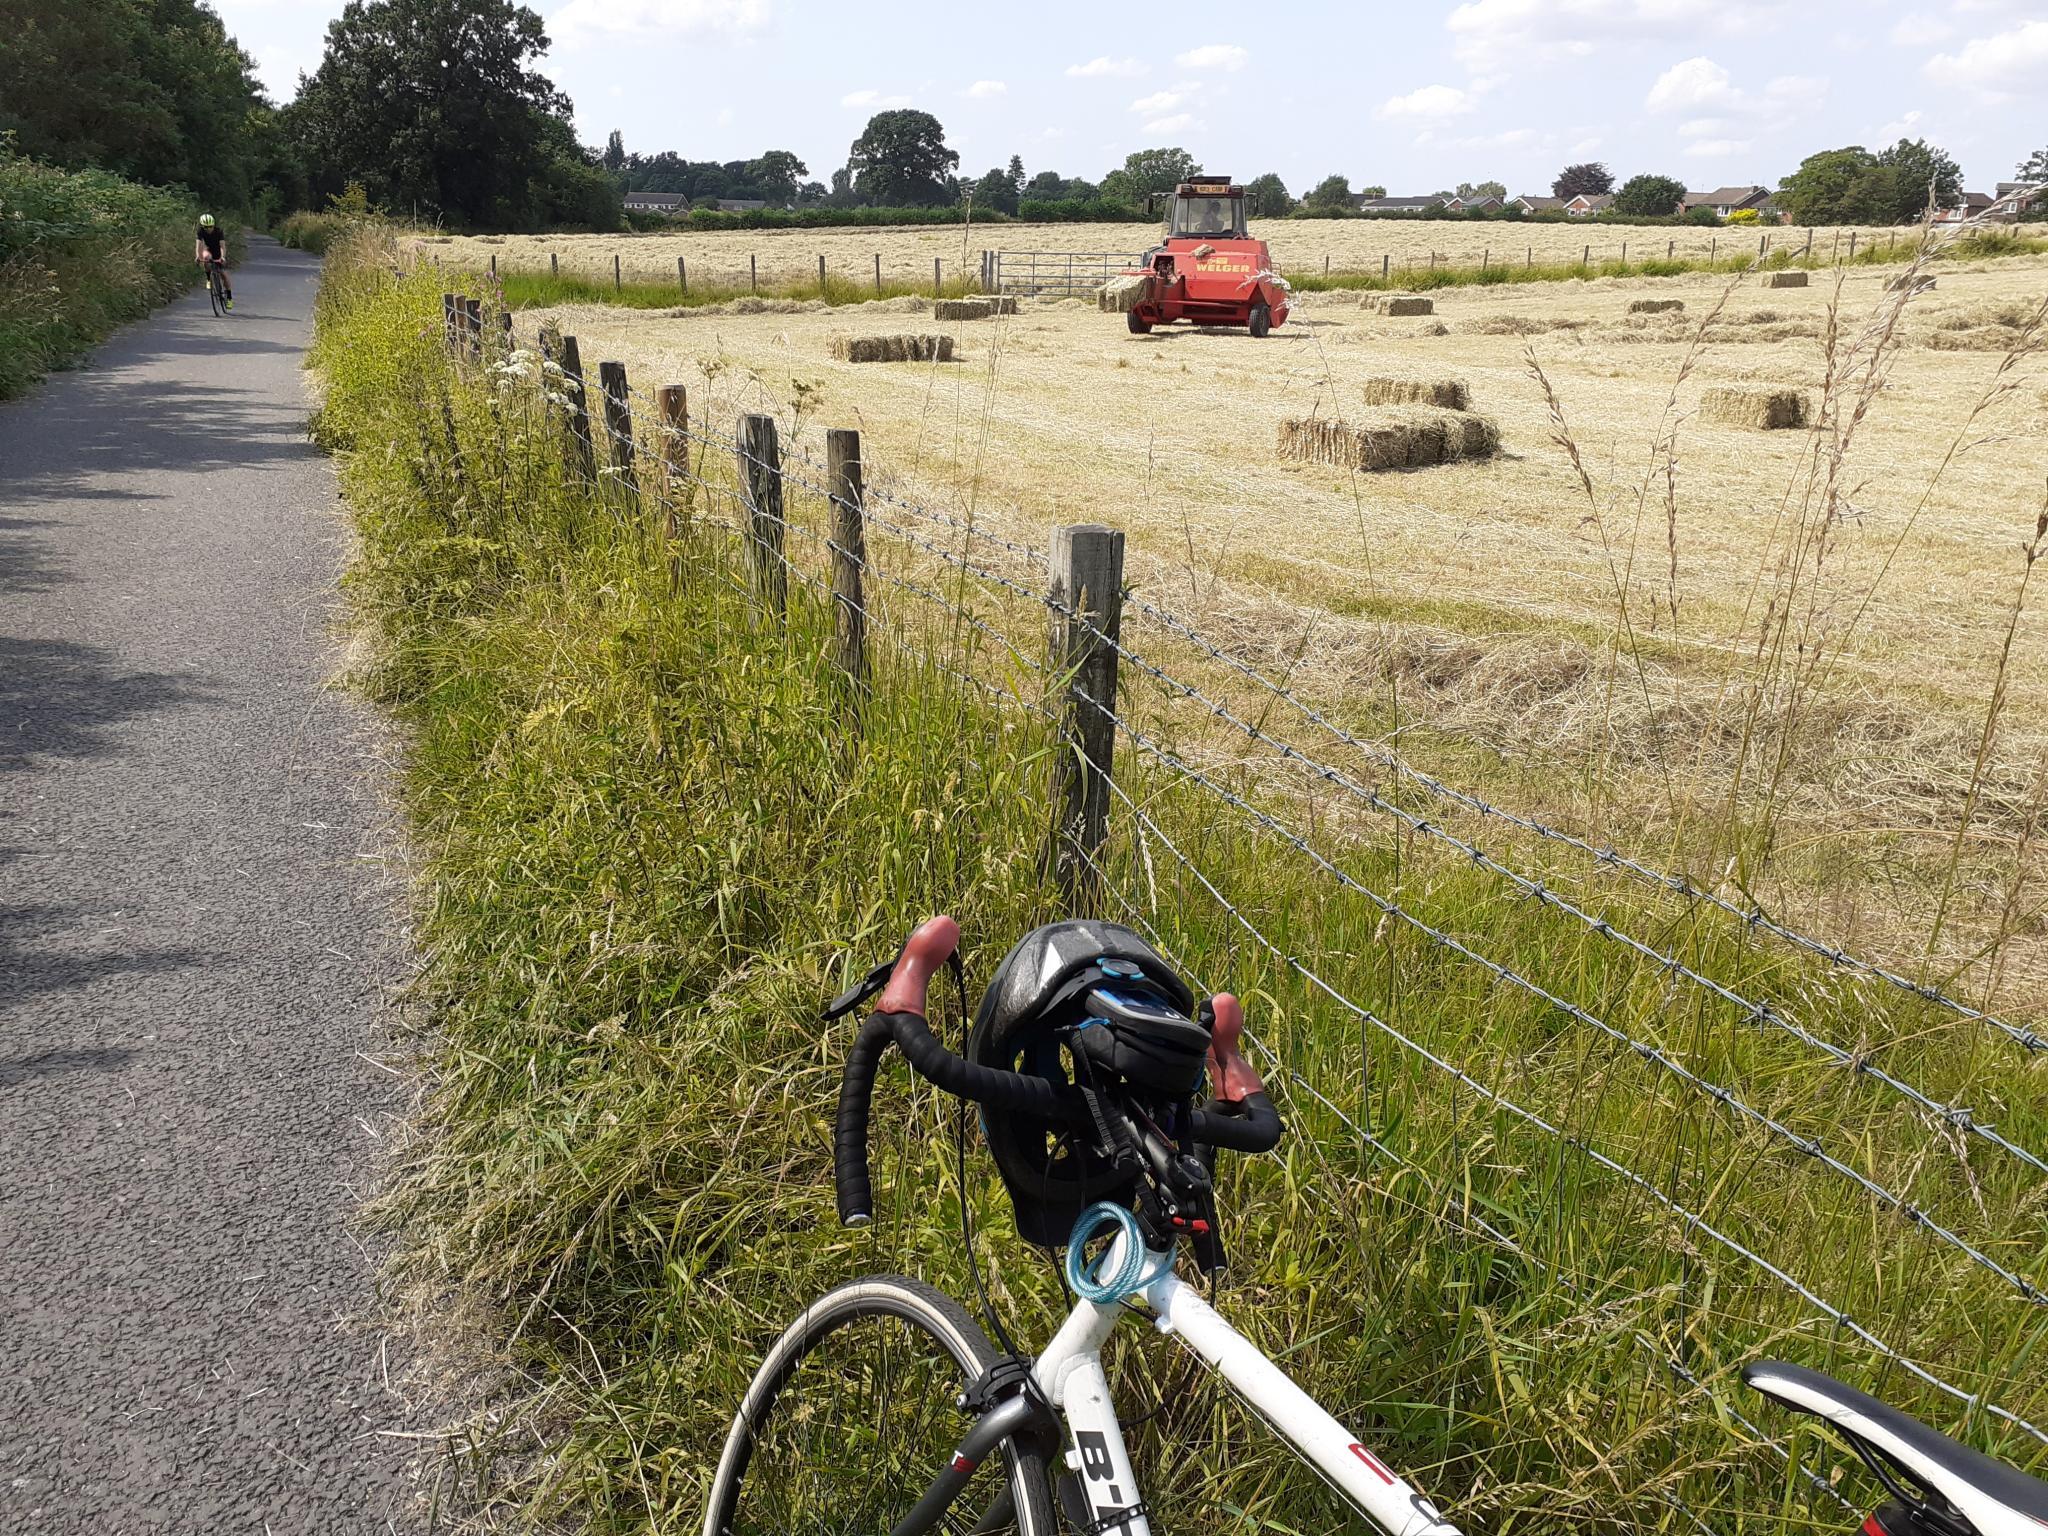 On my bike-20210718_152655-jpg